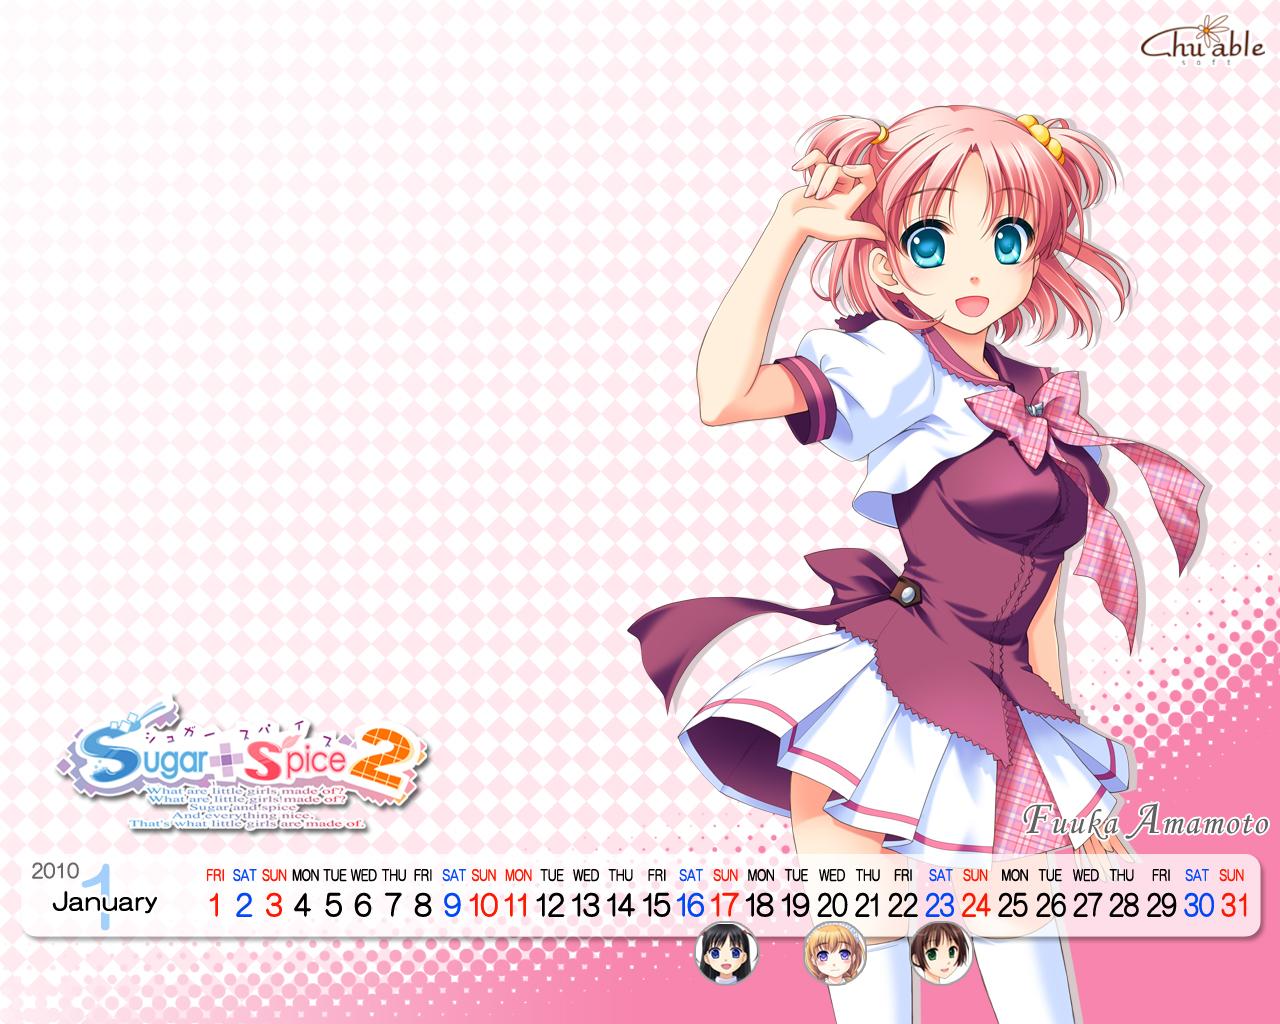 amamoto_fuuka ginta pink_hair school_uniform skirt sugar+spice_2 twintails